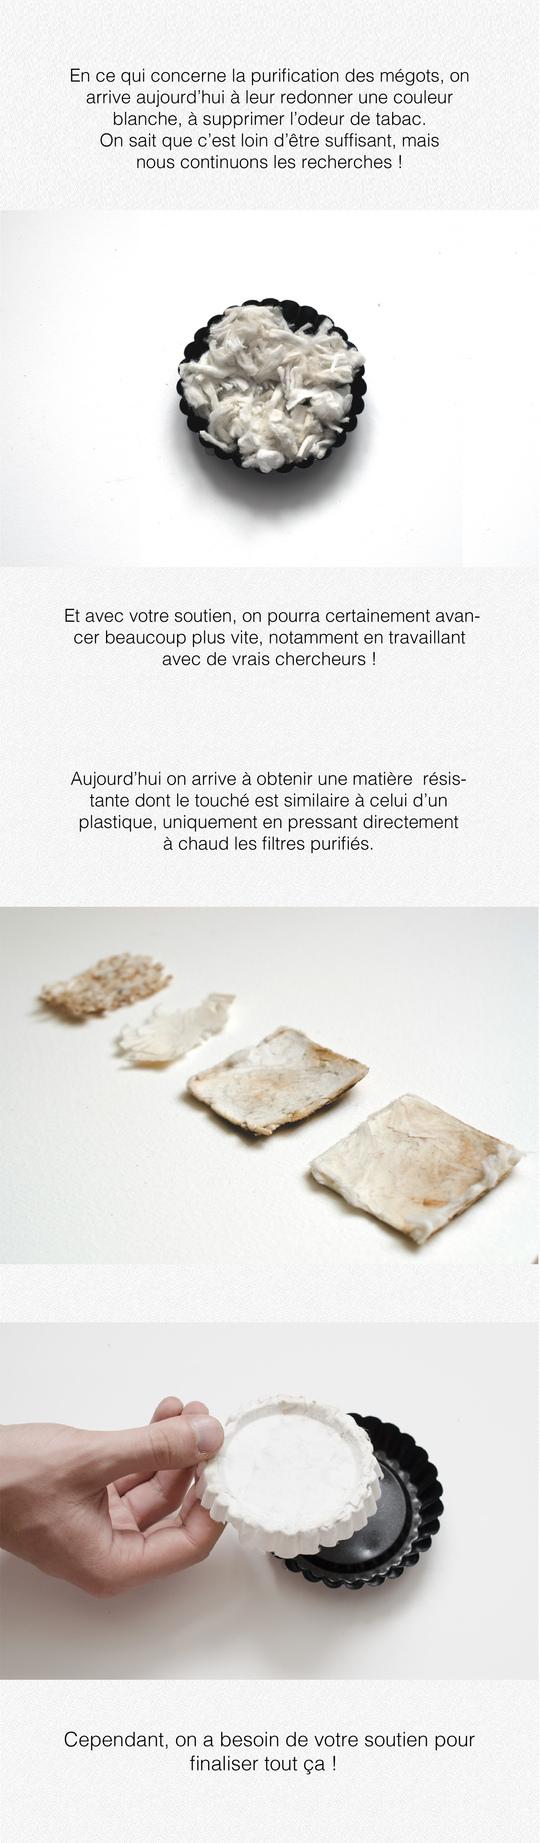 Textmilieu2-01_copie-1432161959